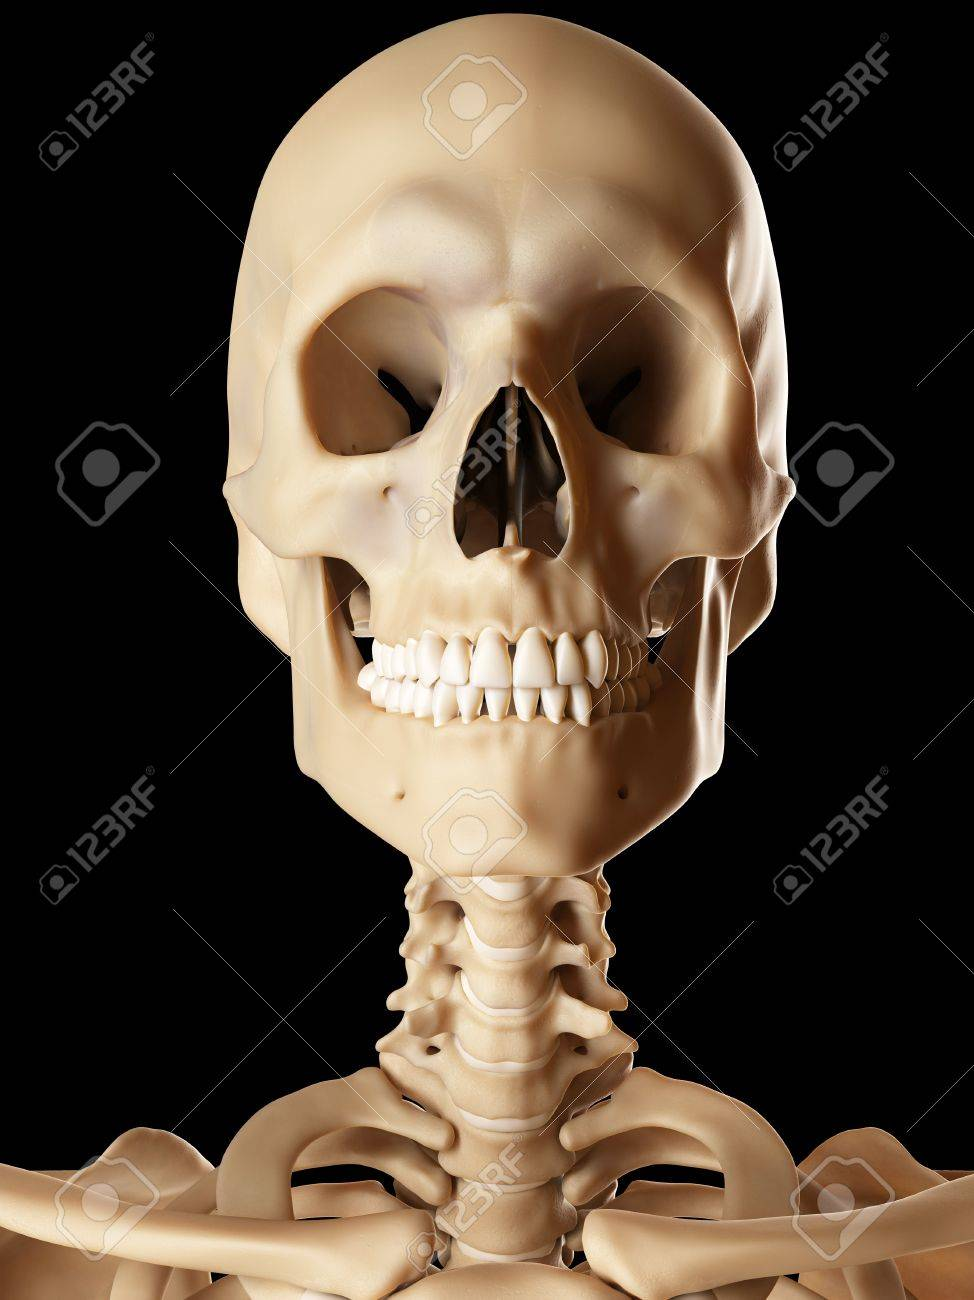 Human skull and neck bones illustration stock photo picture and human skull and neck bones illustration stock photo 76283768 ccuart Gallery